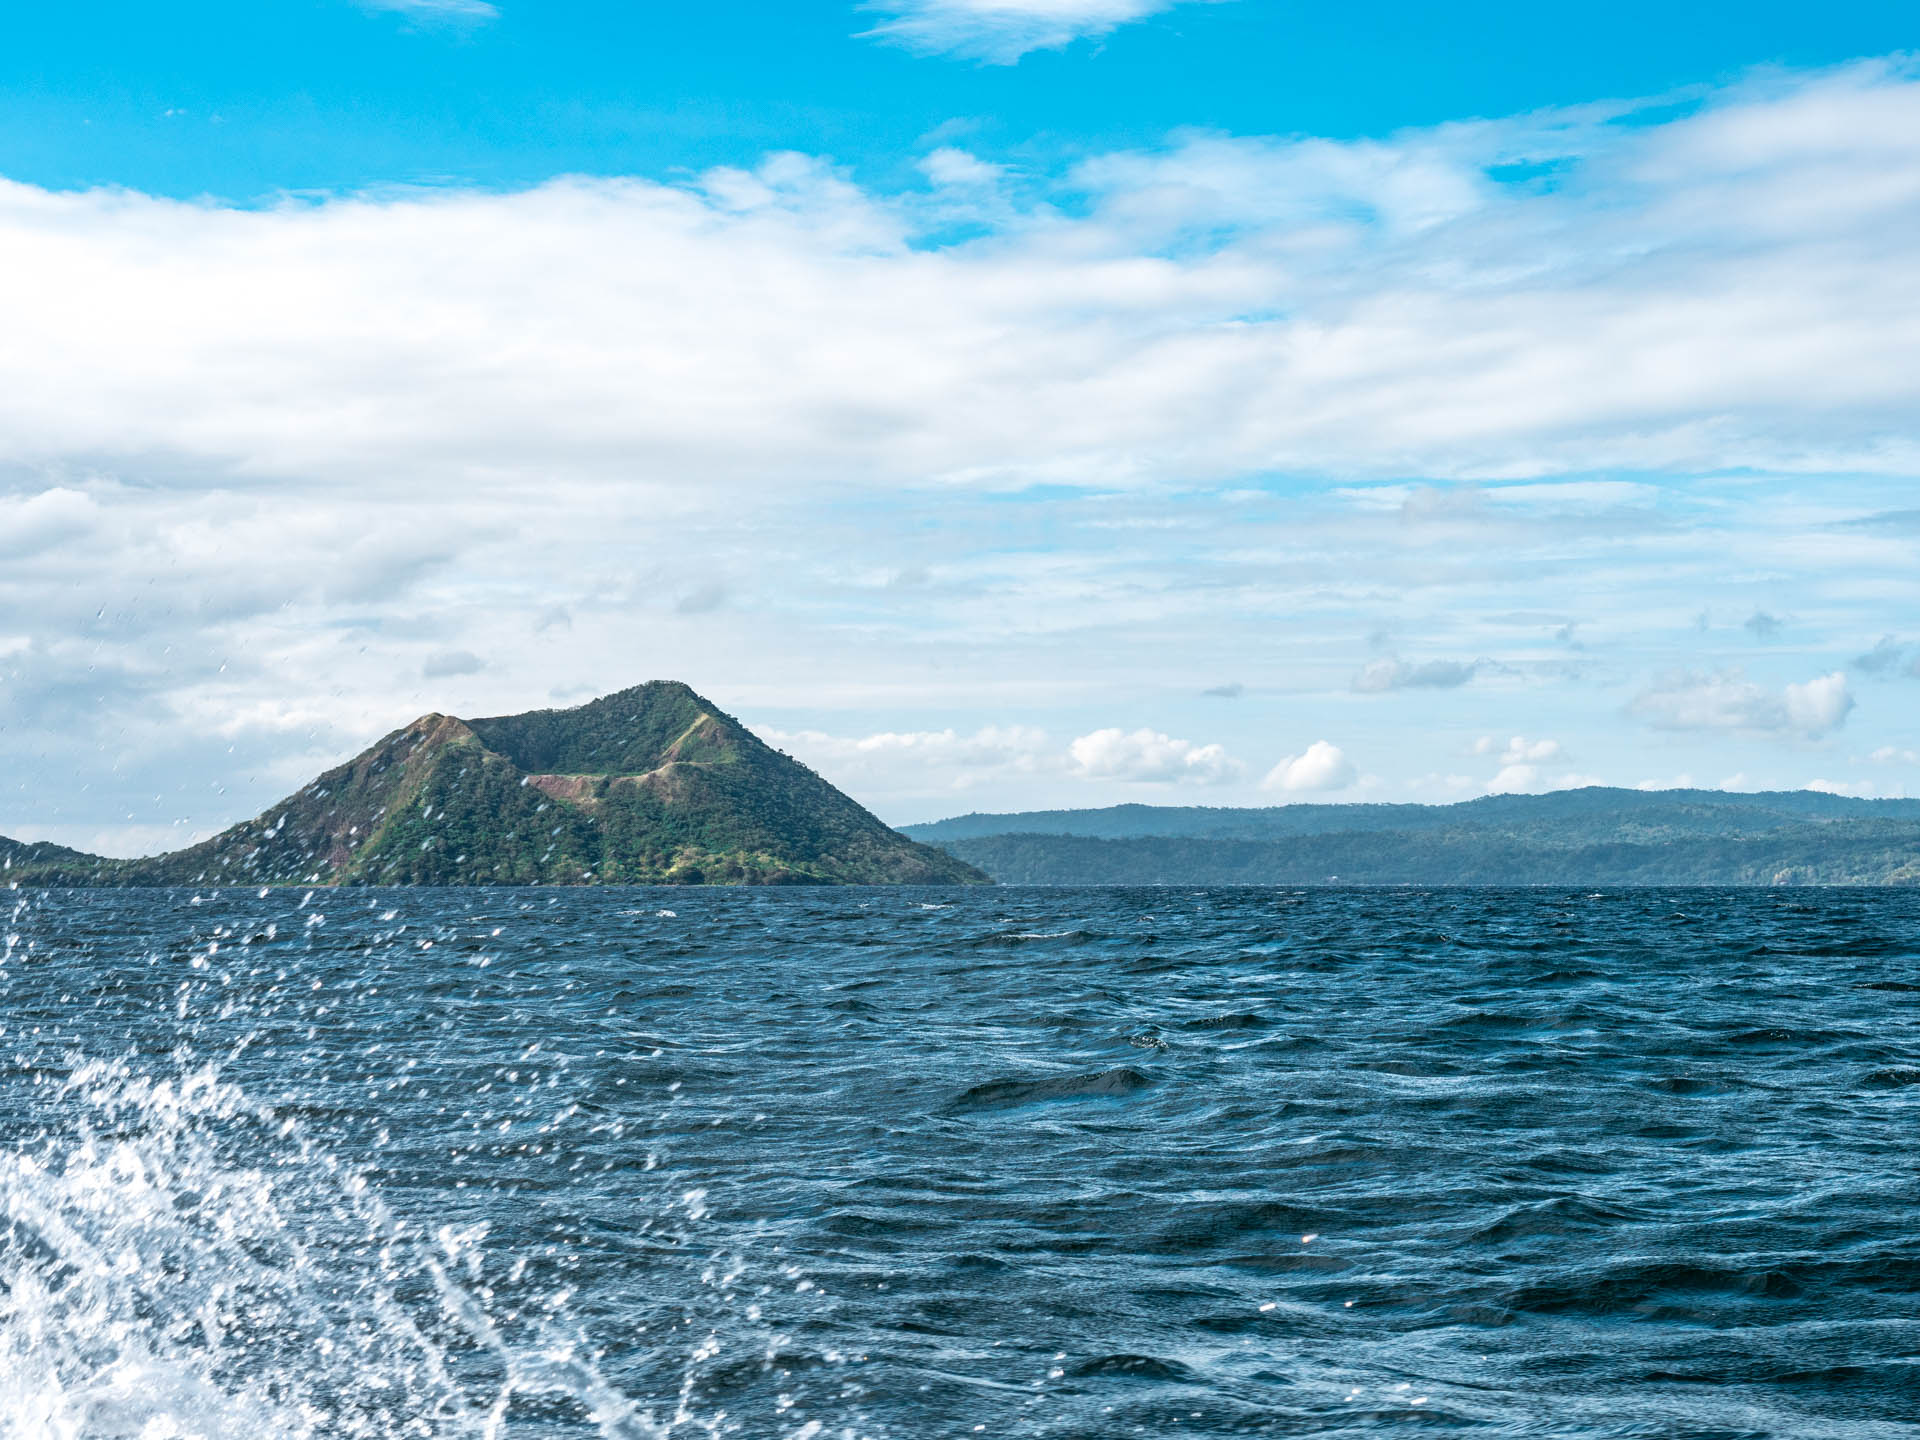 tagaytay bateau - Les globe blogueurs - blog voyage nature